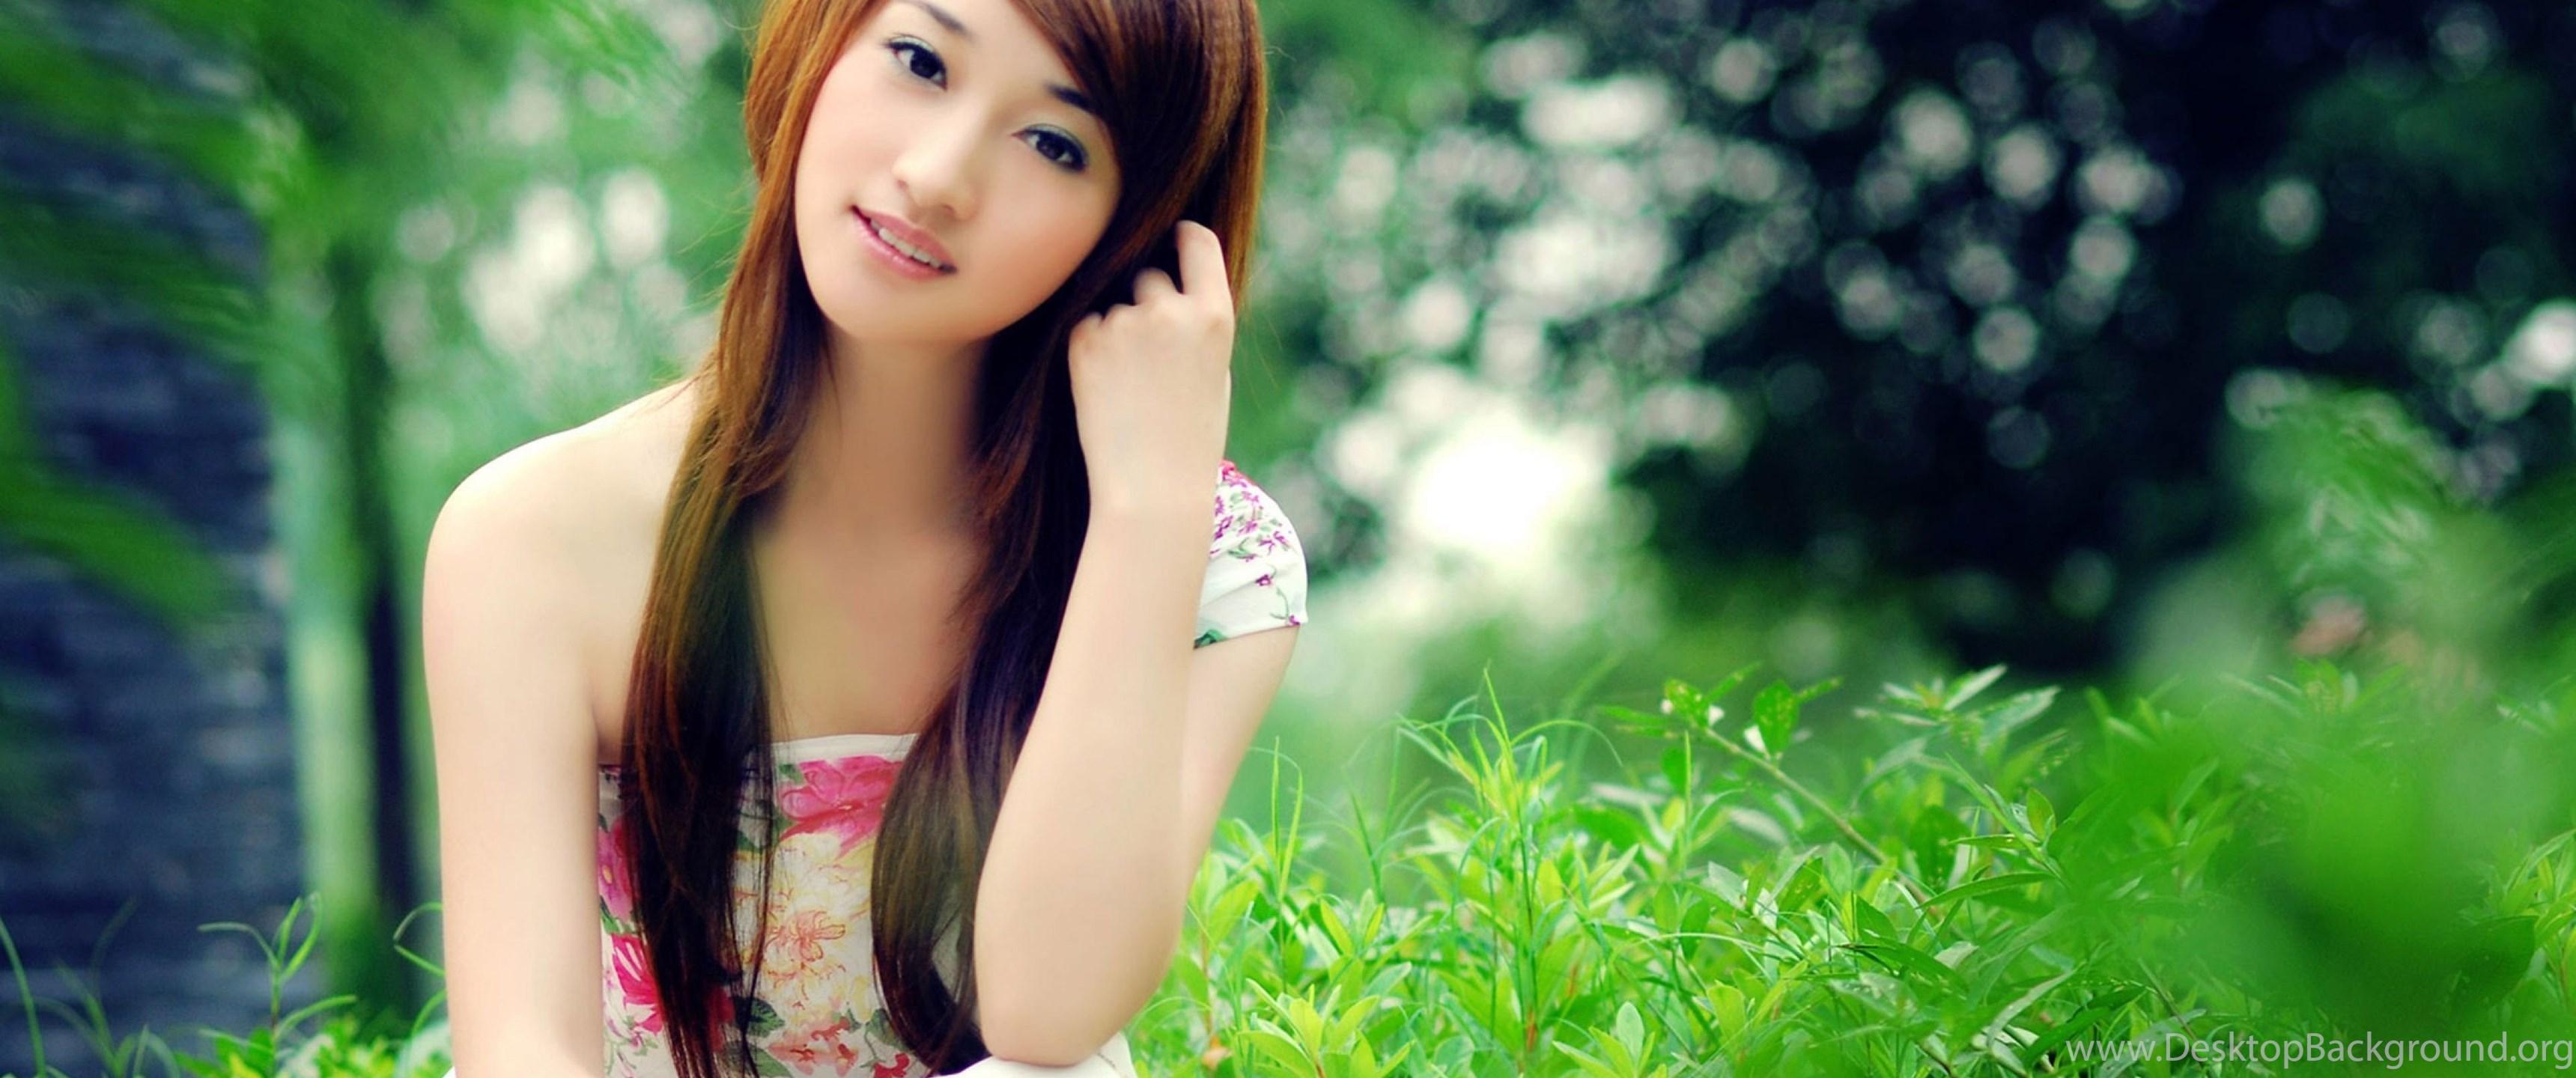 download wallpapers 3840x2160 asian, girl, dress 4k ultra hd hd